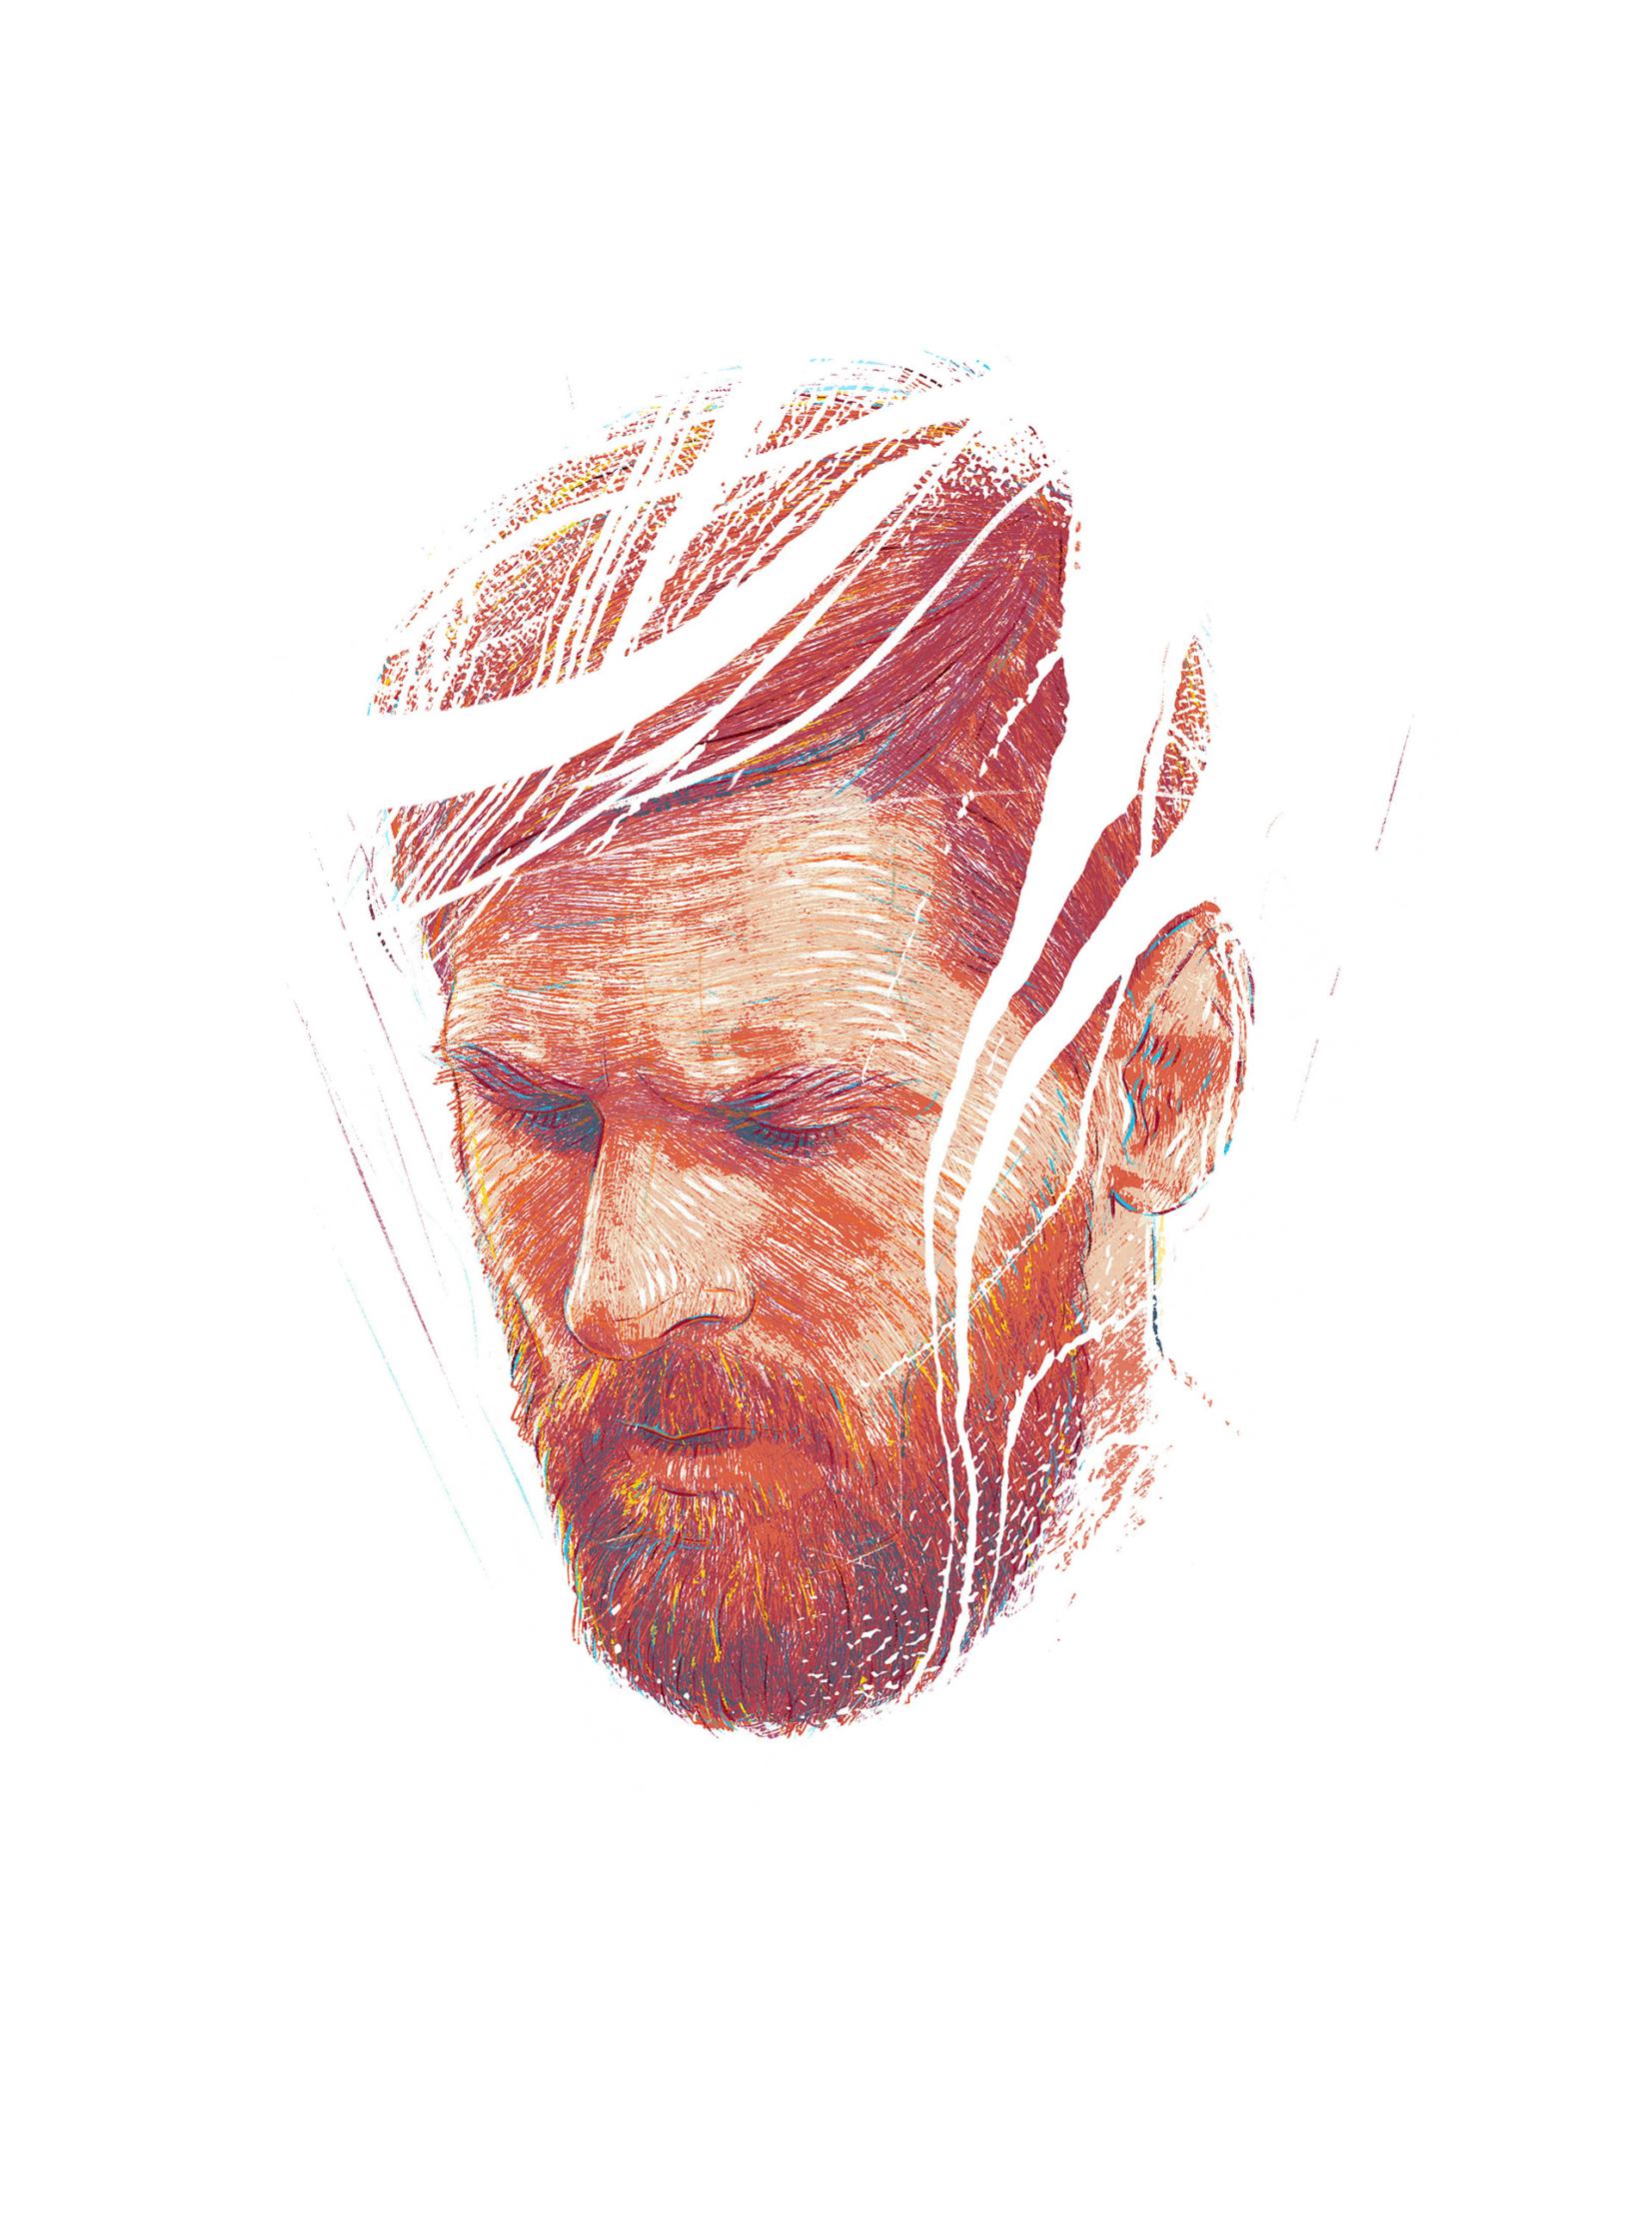 01_Messi02.jpg